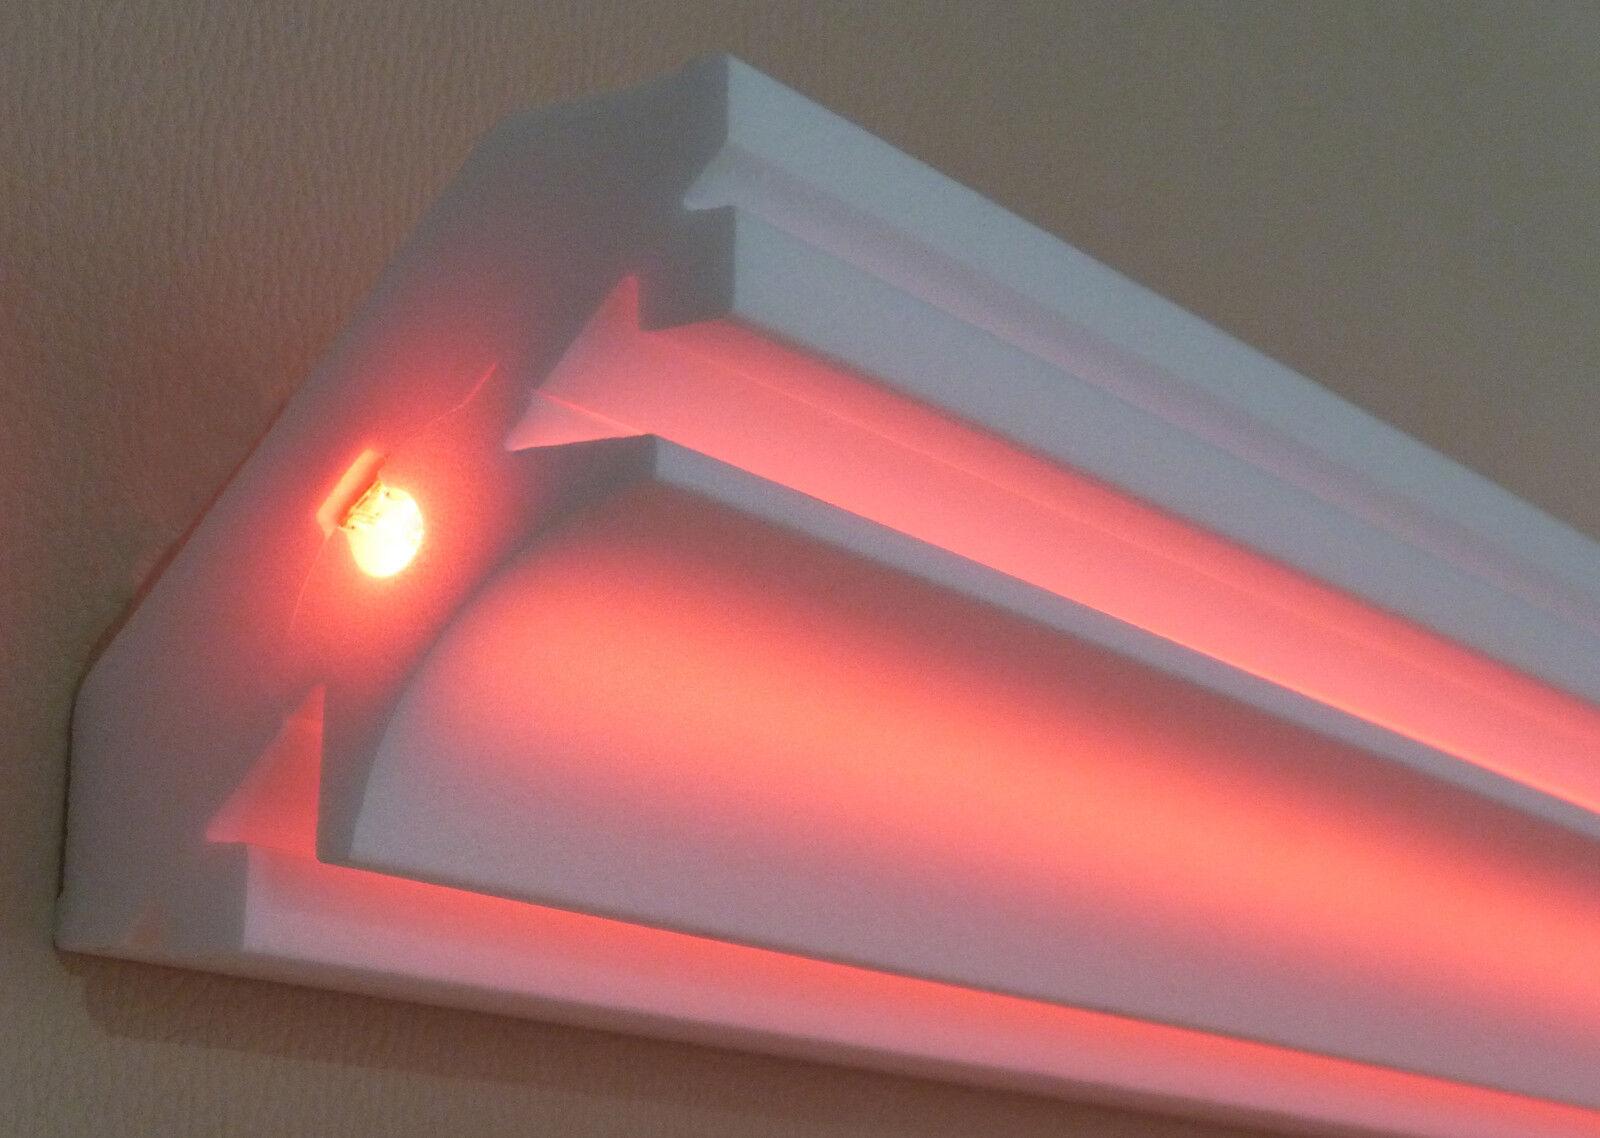 stuckleisten stuckprofile12 m 2 ecken indirekte beleuchtung led dekor s ren eur 117 50. Black Bedroom Furniture Sets. Home Design Ideas